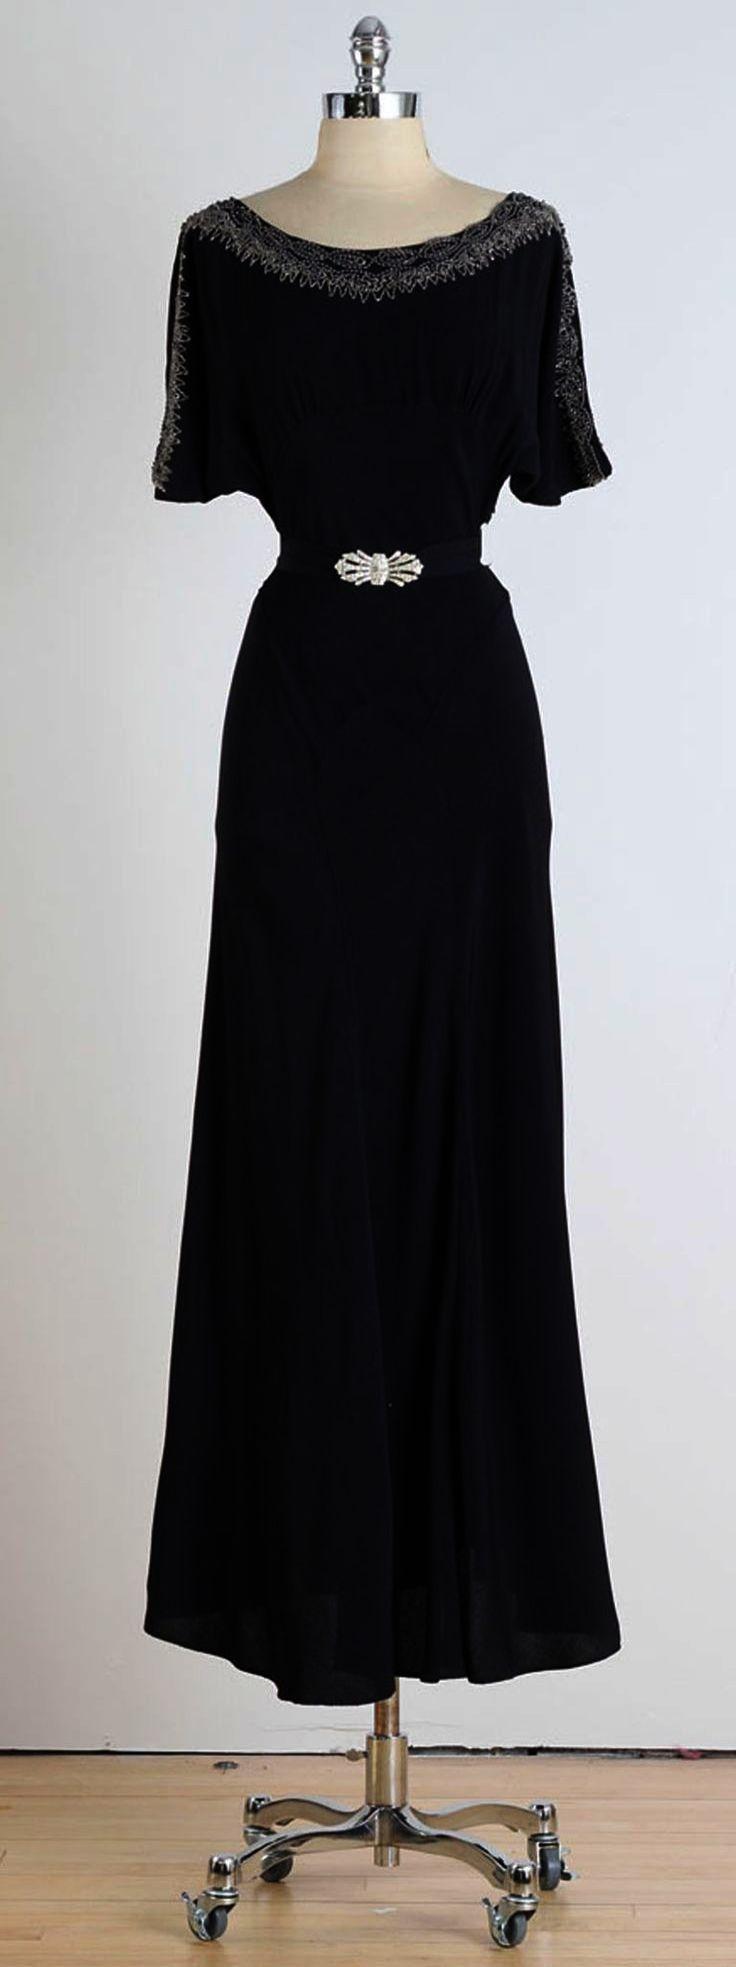 50s Dress Fashion Vintage Dress Online Malaysia Vintage Dresses Online Evening Dresses Vintage Lace Evening Dresses